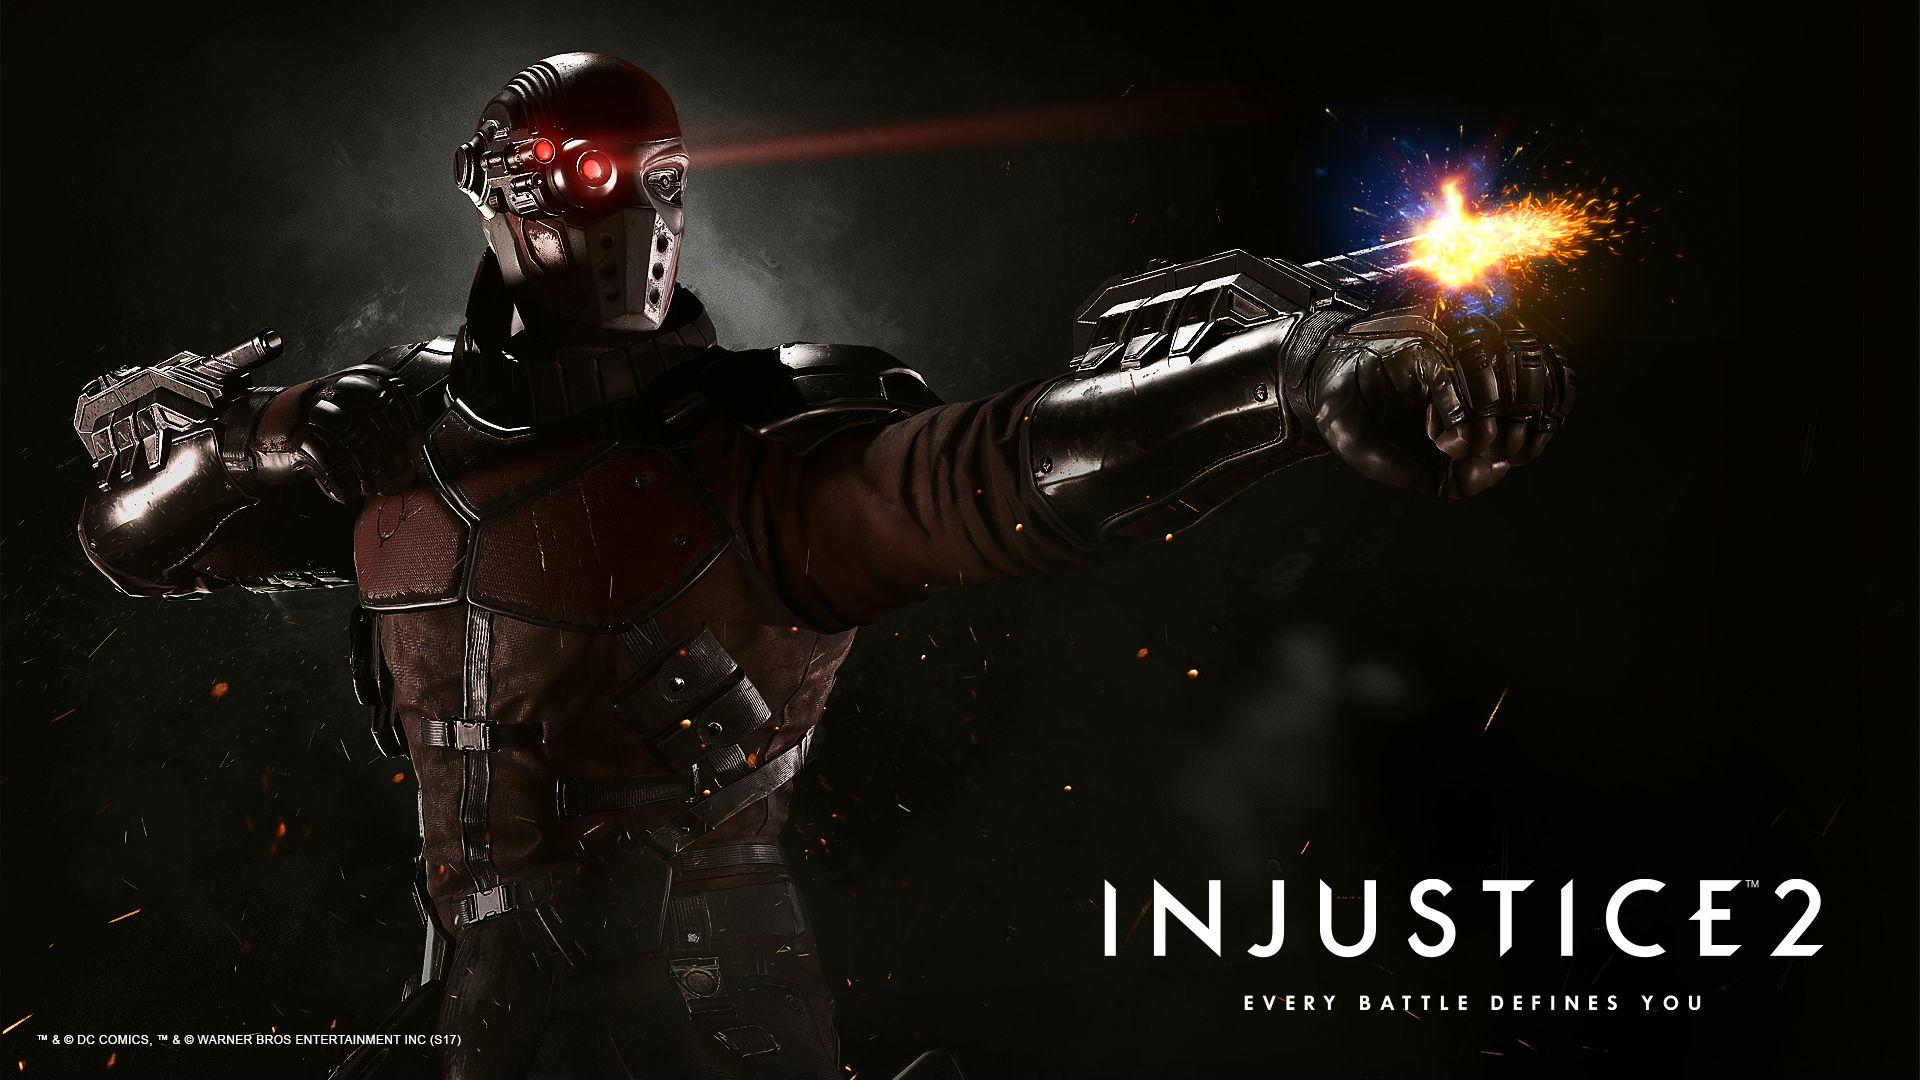 Injustice 2 - Injustice 2